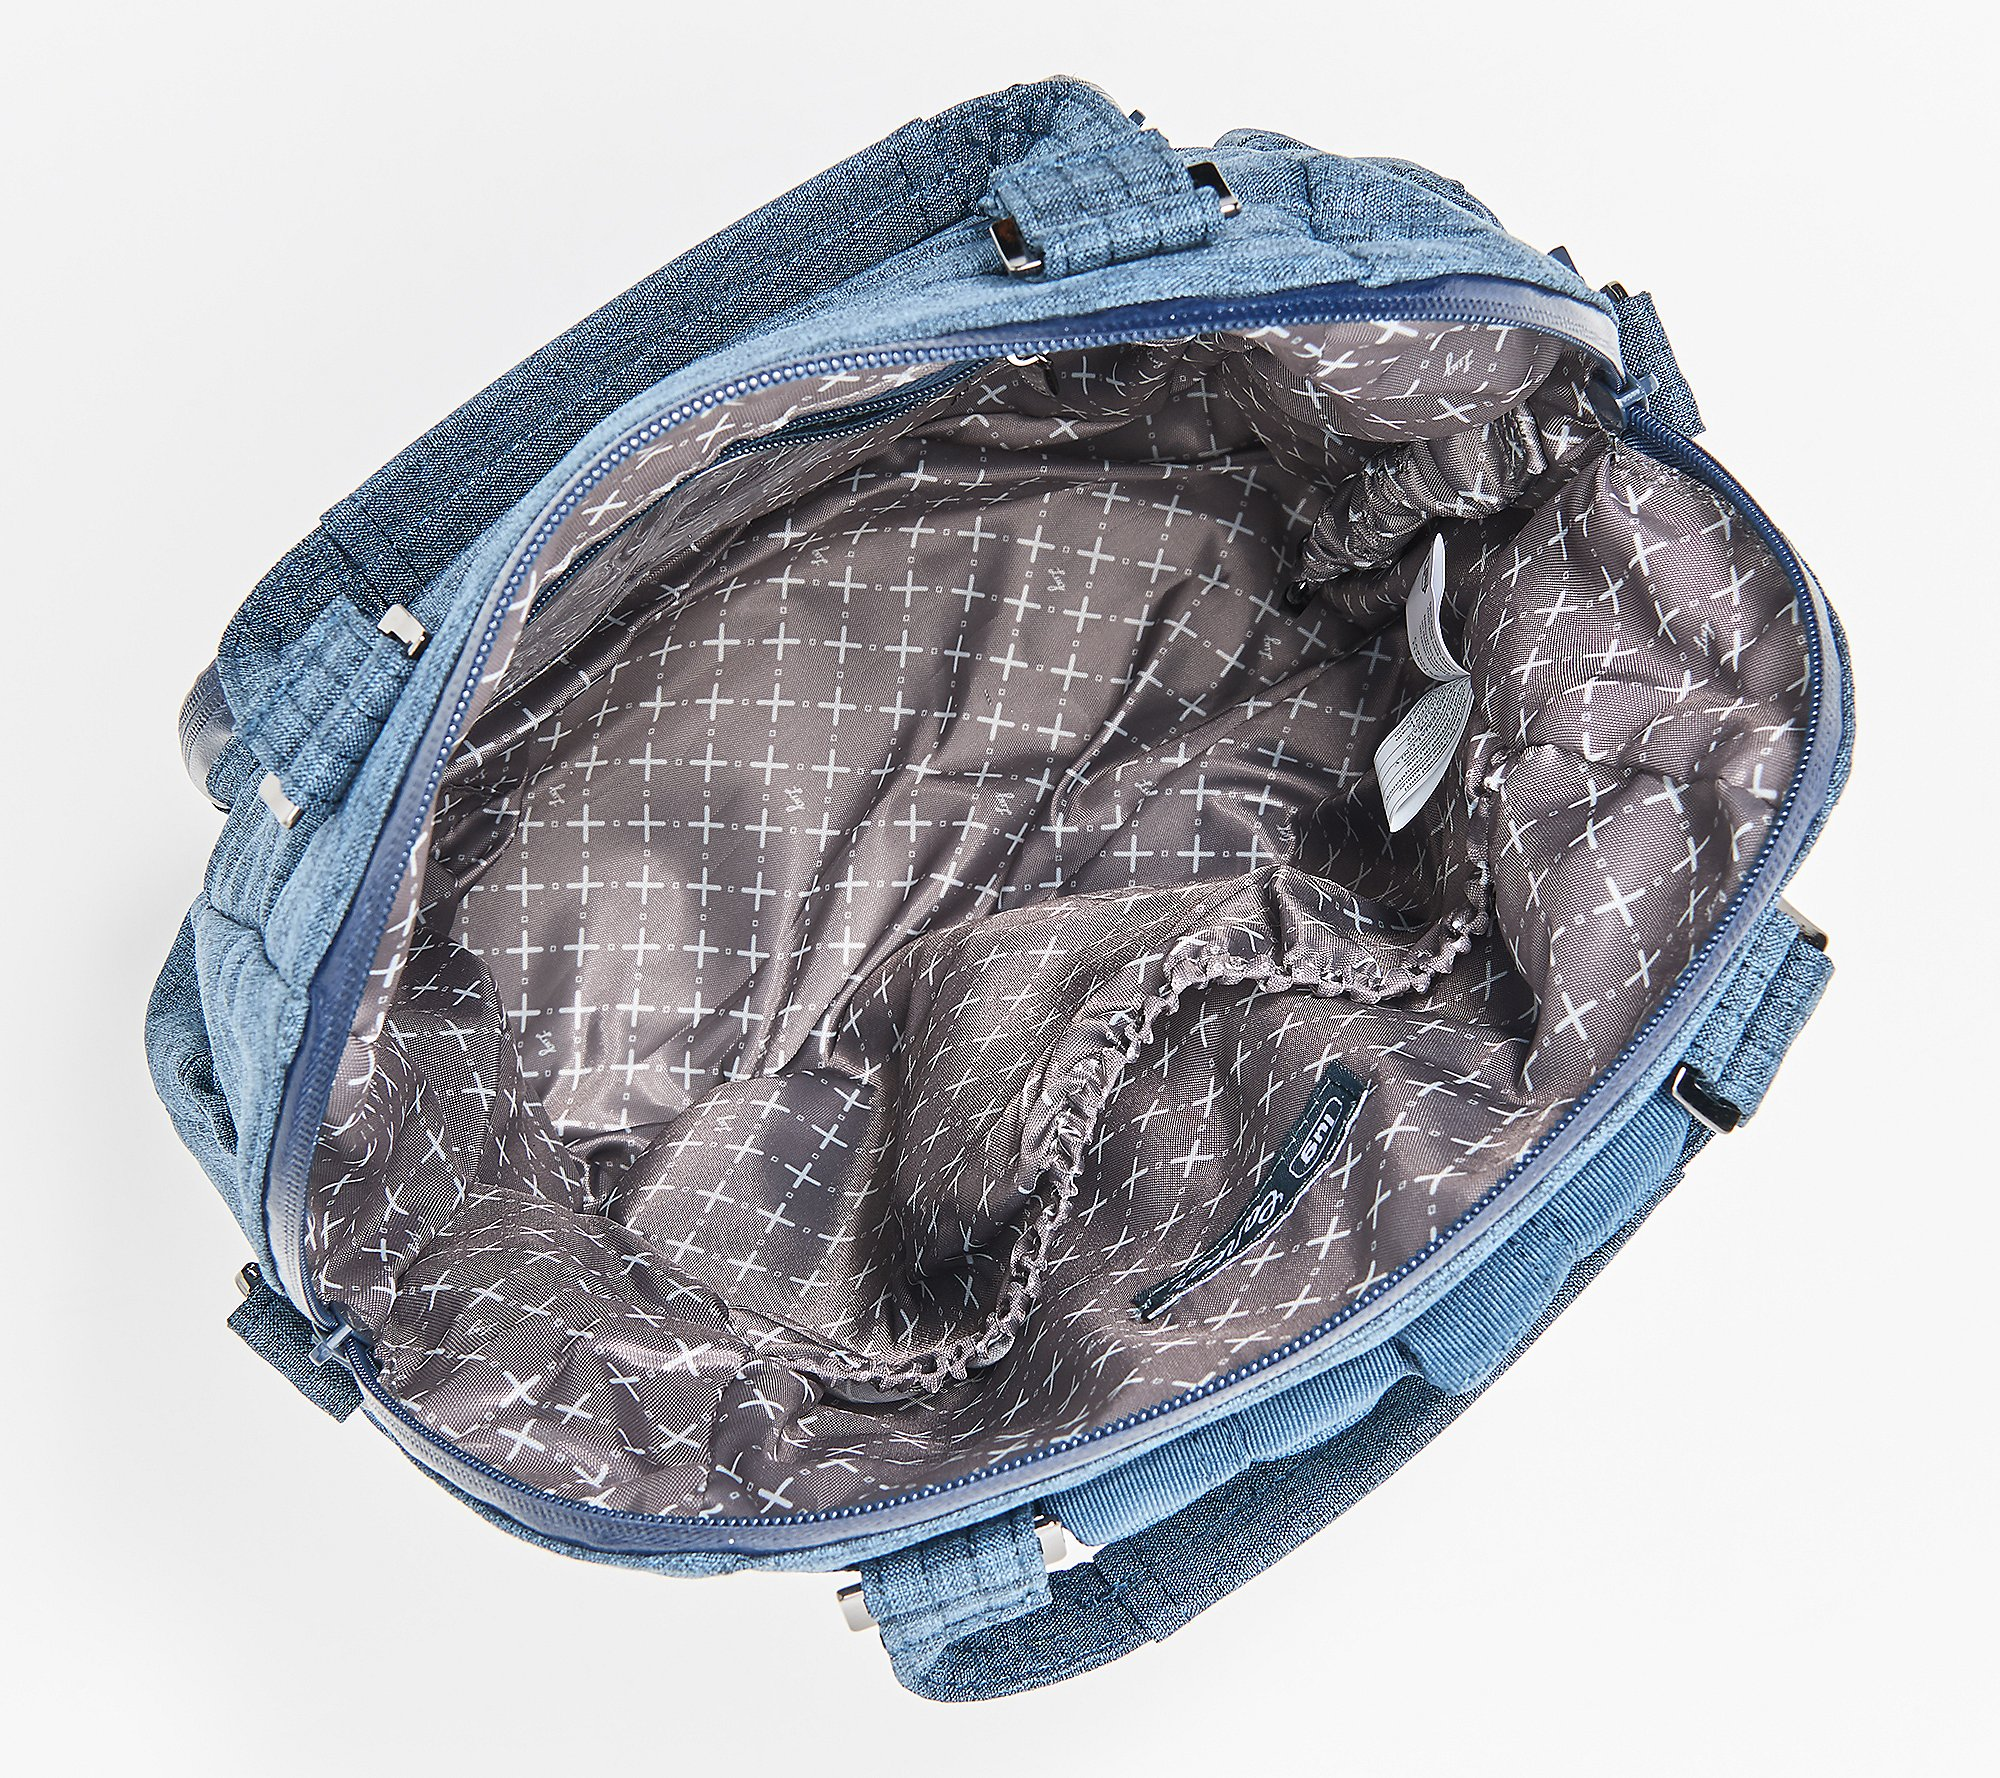 Toys r Us plastic shopping bag lot Geoffrey 40 bags New  13 x 8 x 23